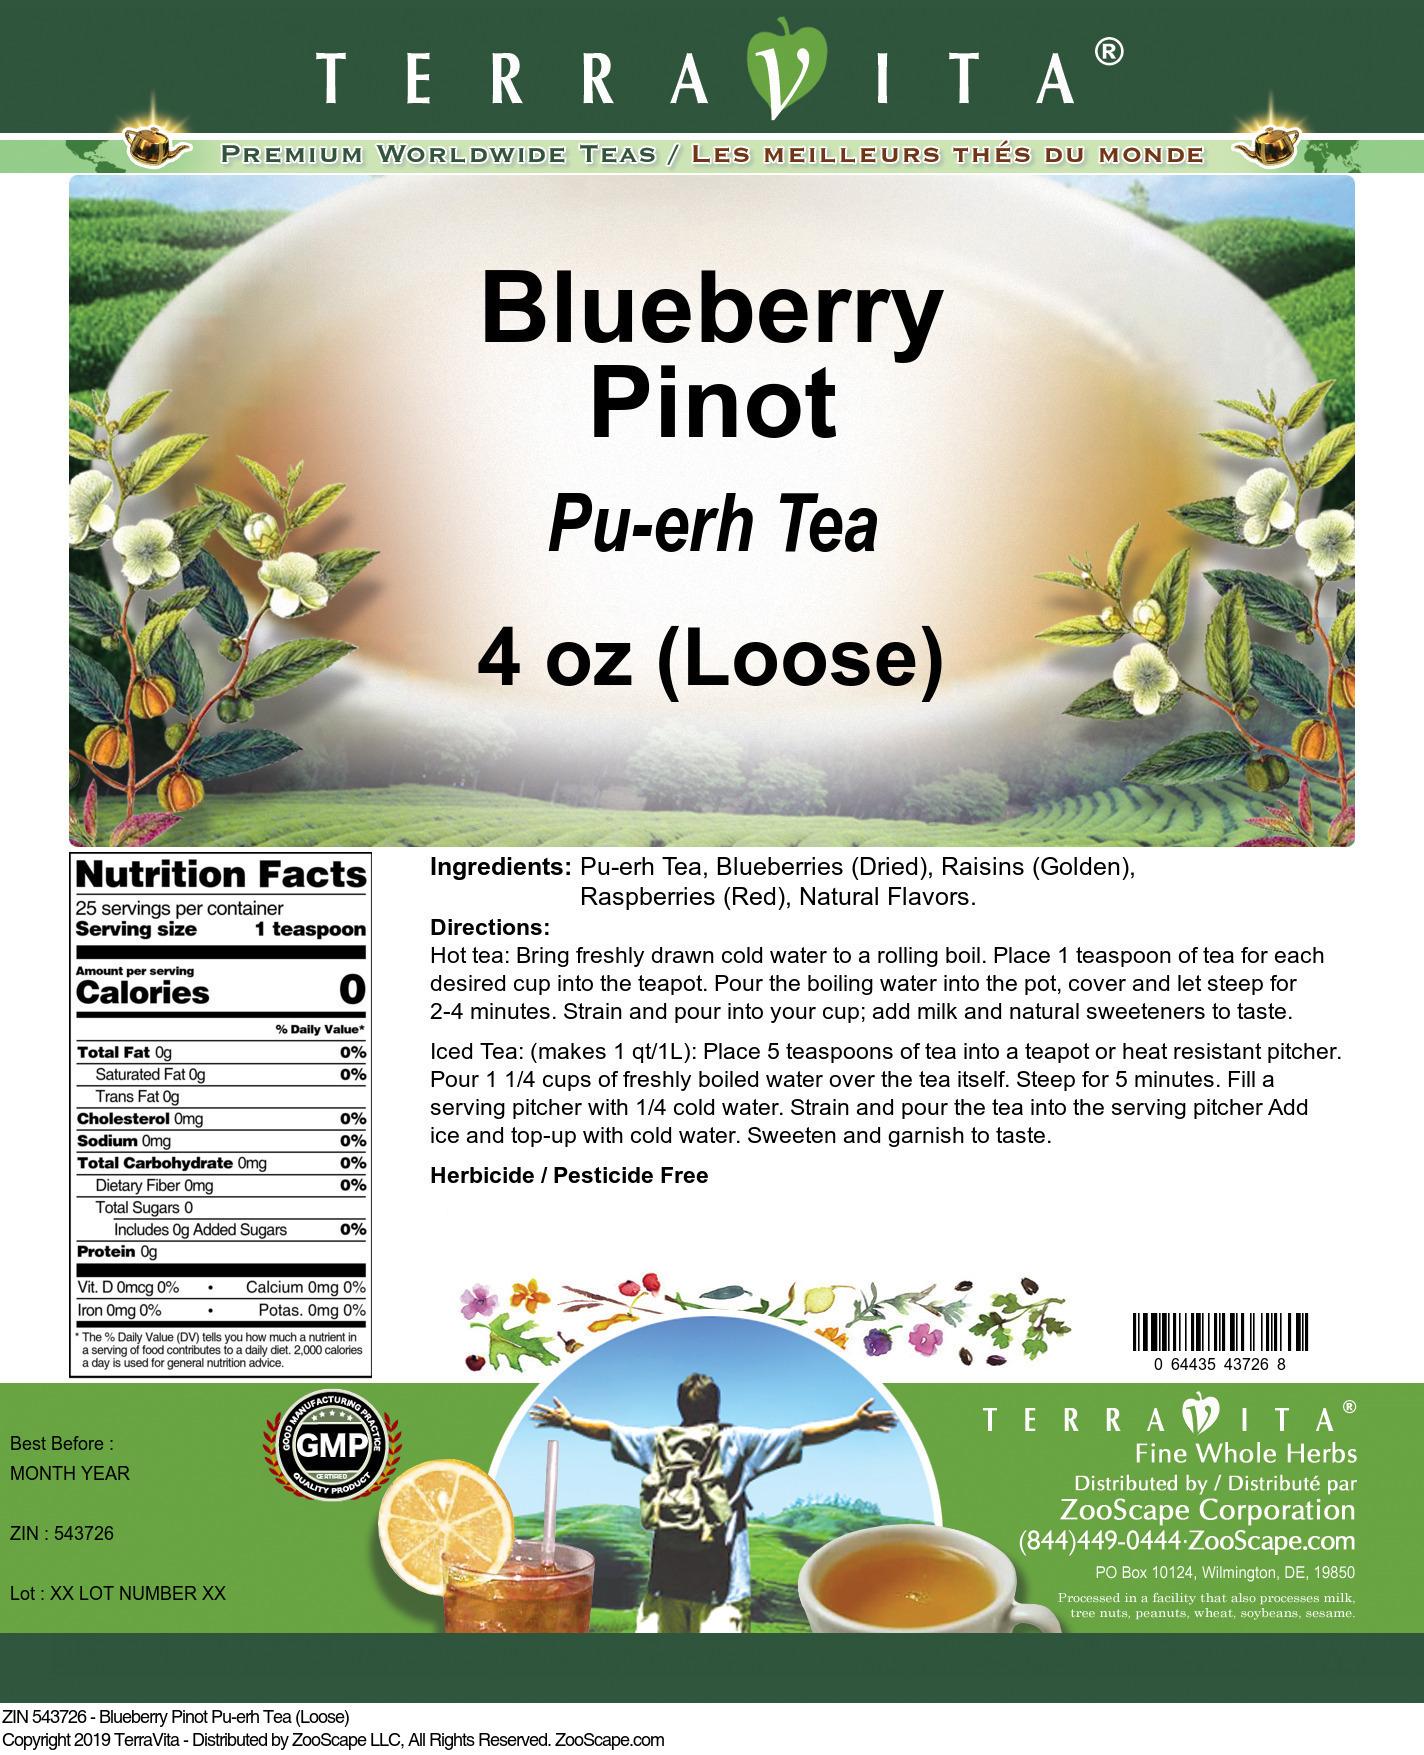 Blueberry Pinot Pu-erh Tea (Loose)